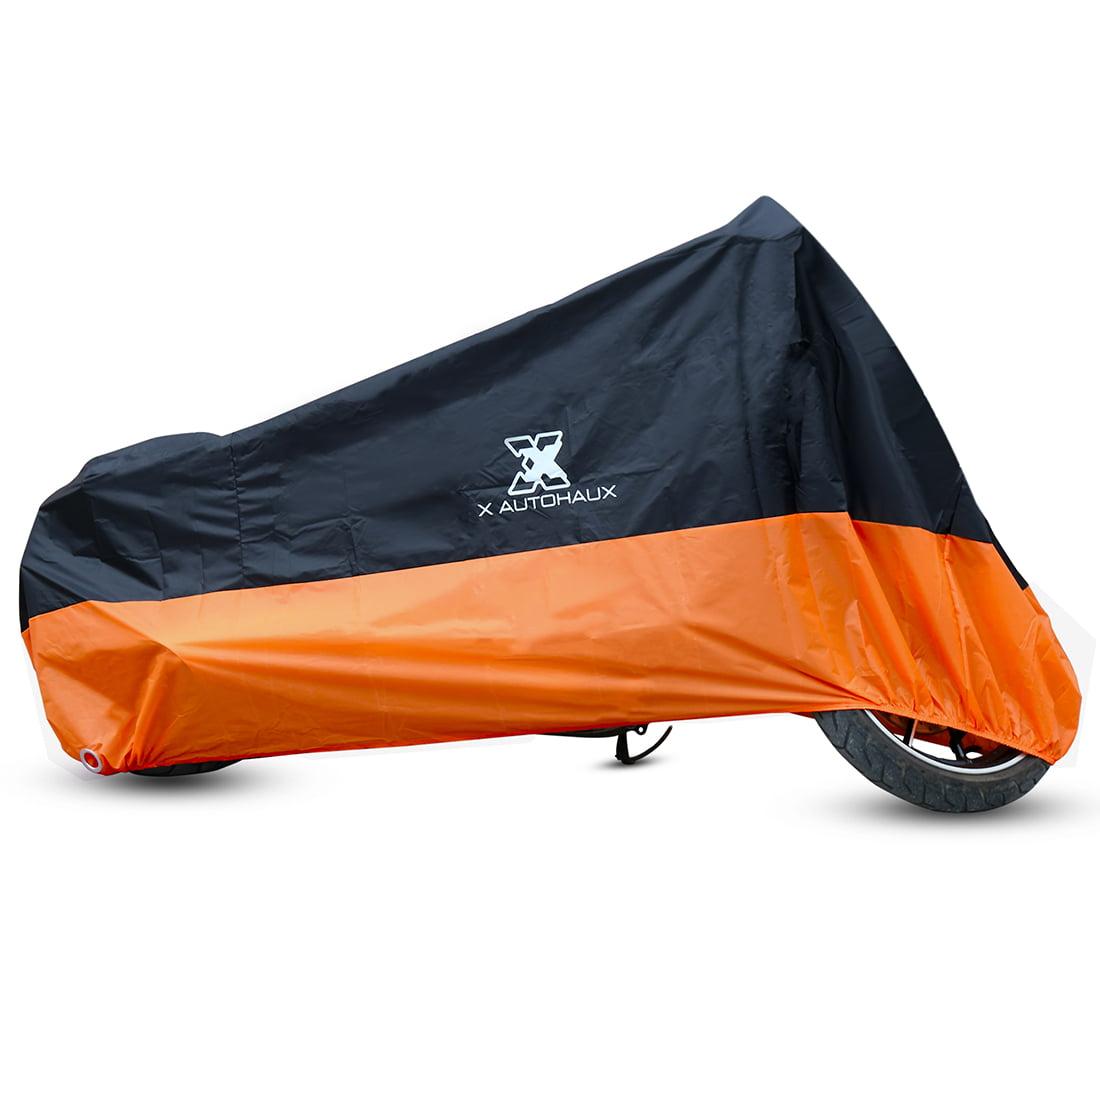 Waterproof Motorcycle Motor Cover XXL Outdoor Rain Dust Protector Drawstring Bag